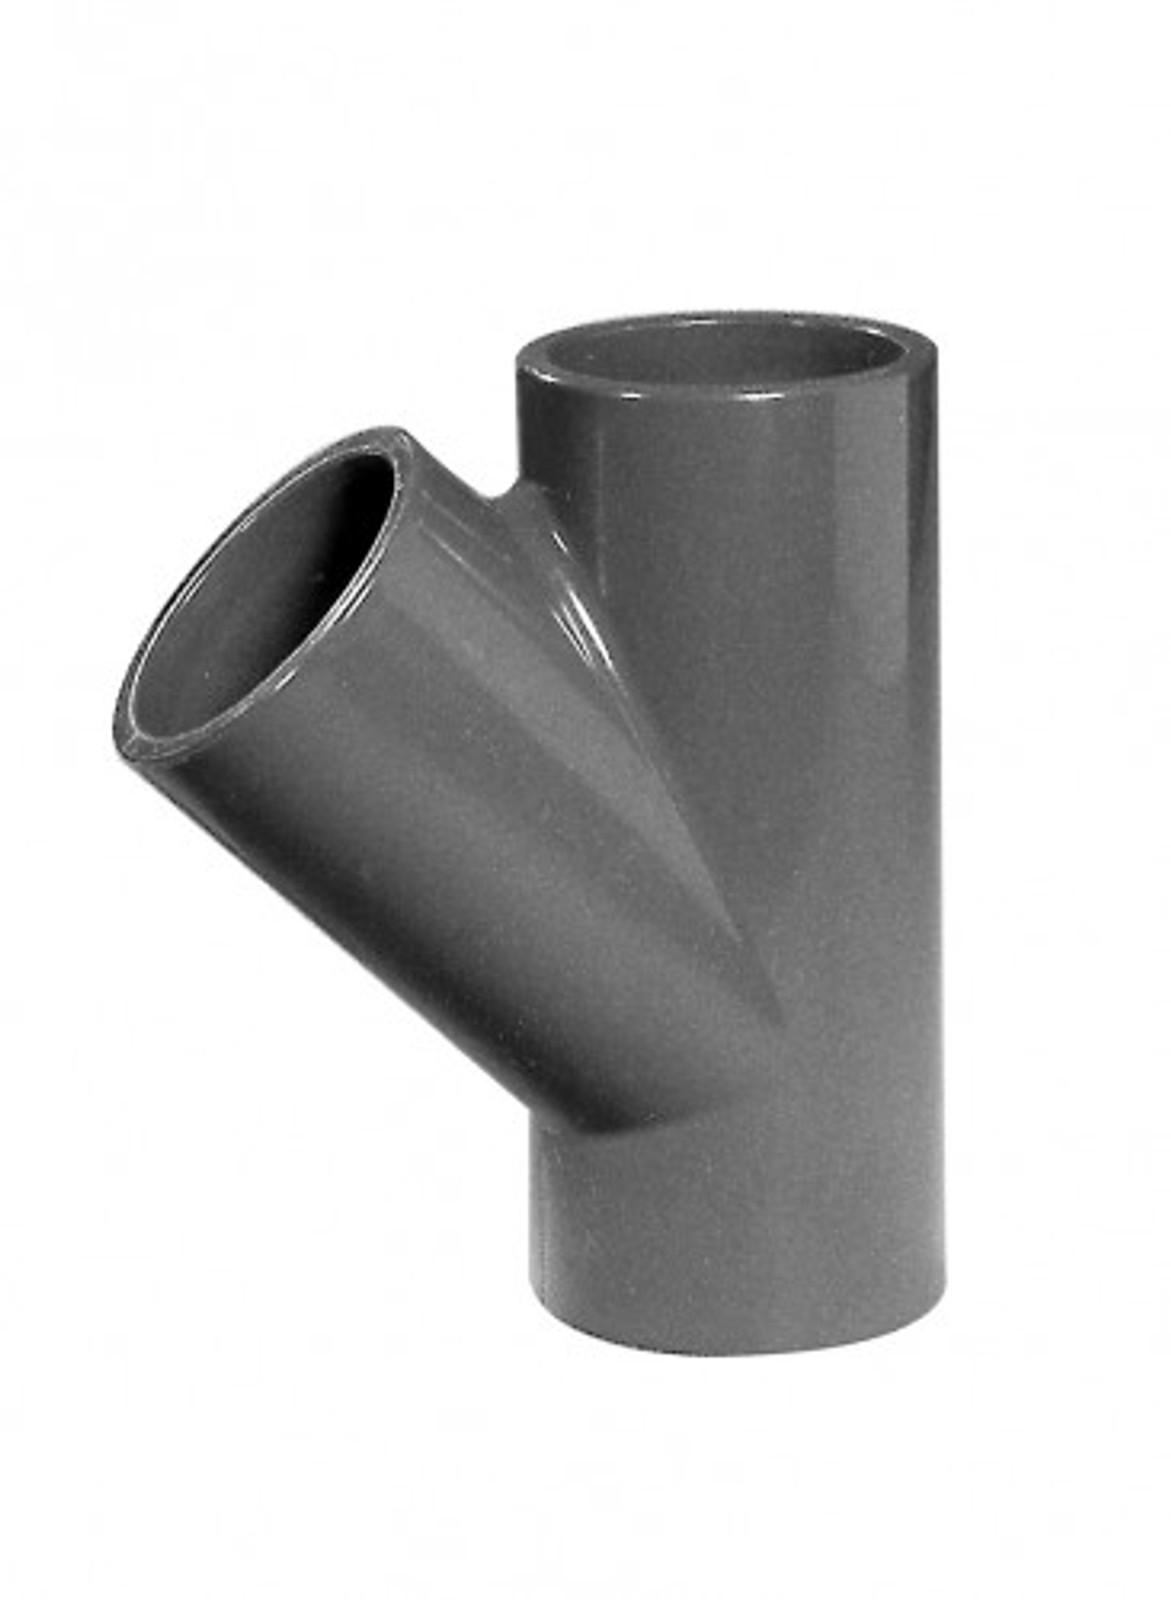 T-Stück 45°, 25 mm aus PVC